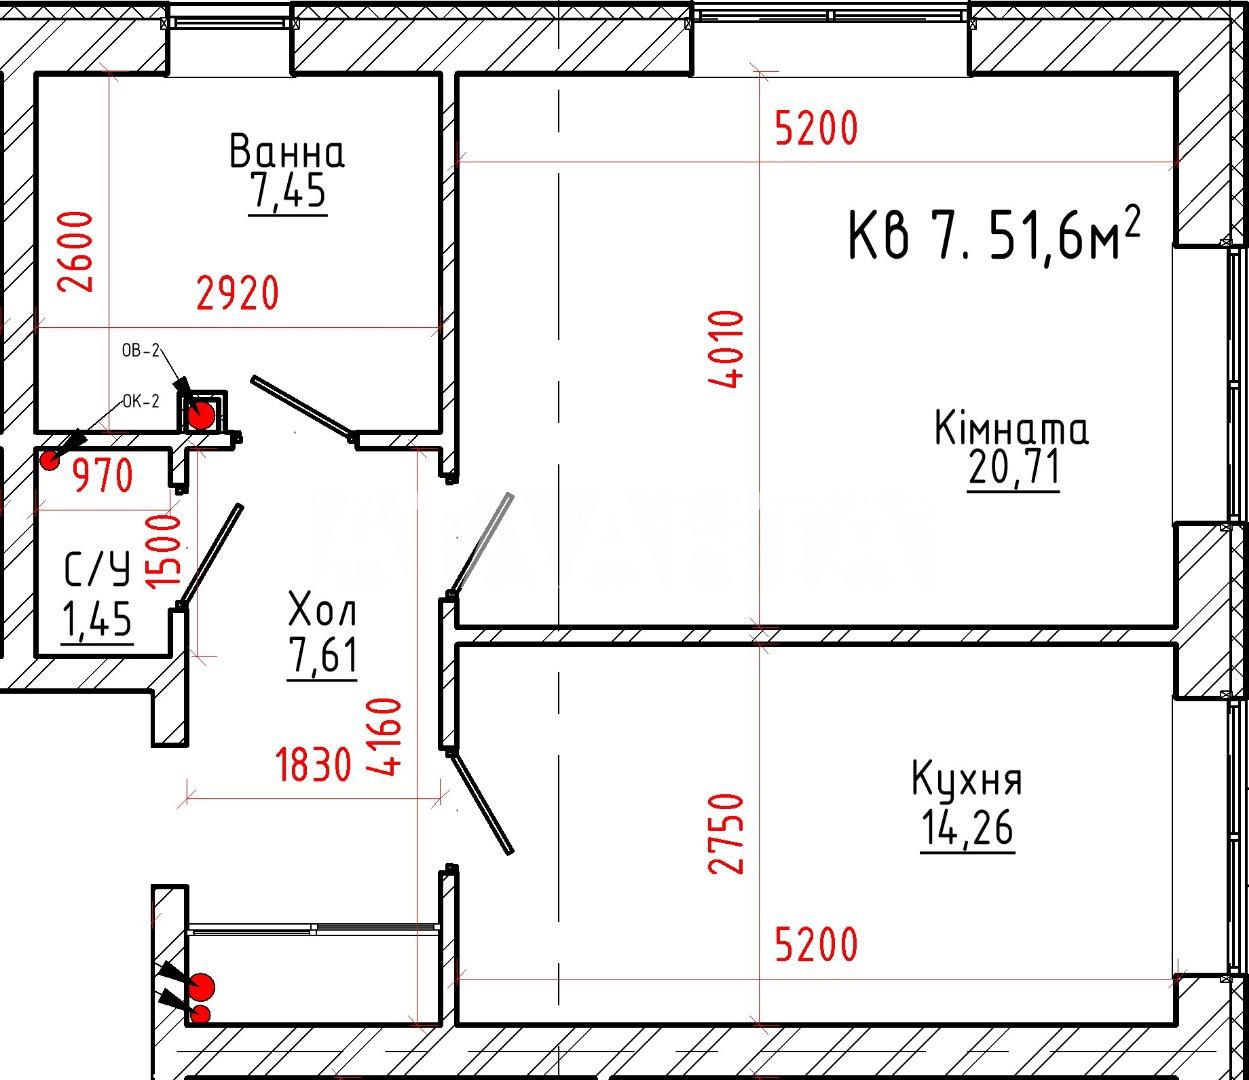 Продается 1-комнатная Квартира на ул. Творческая — 44 500 у.е. (фото №3)